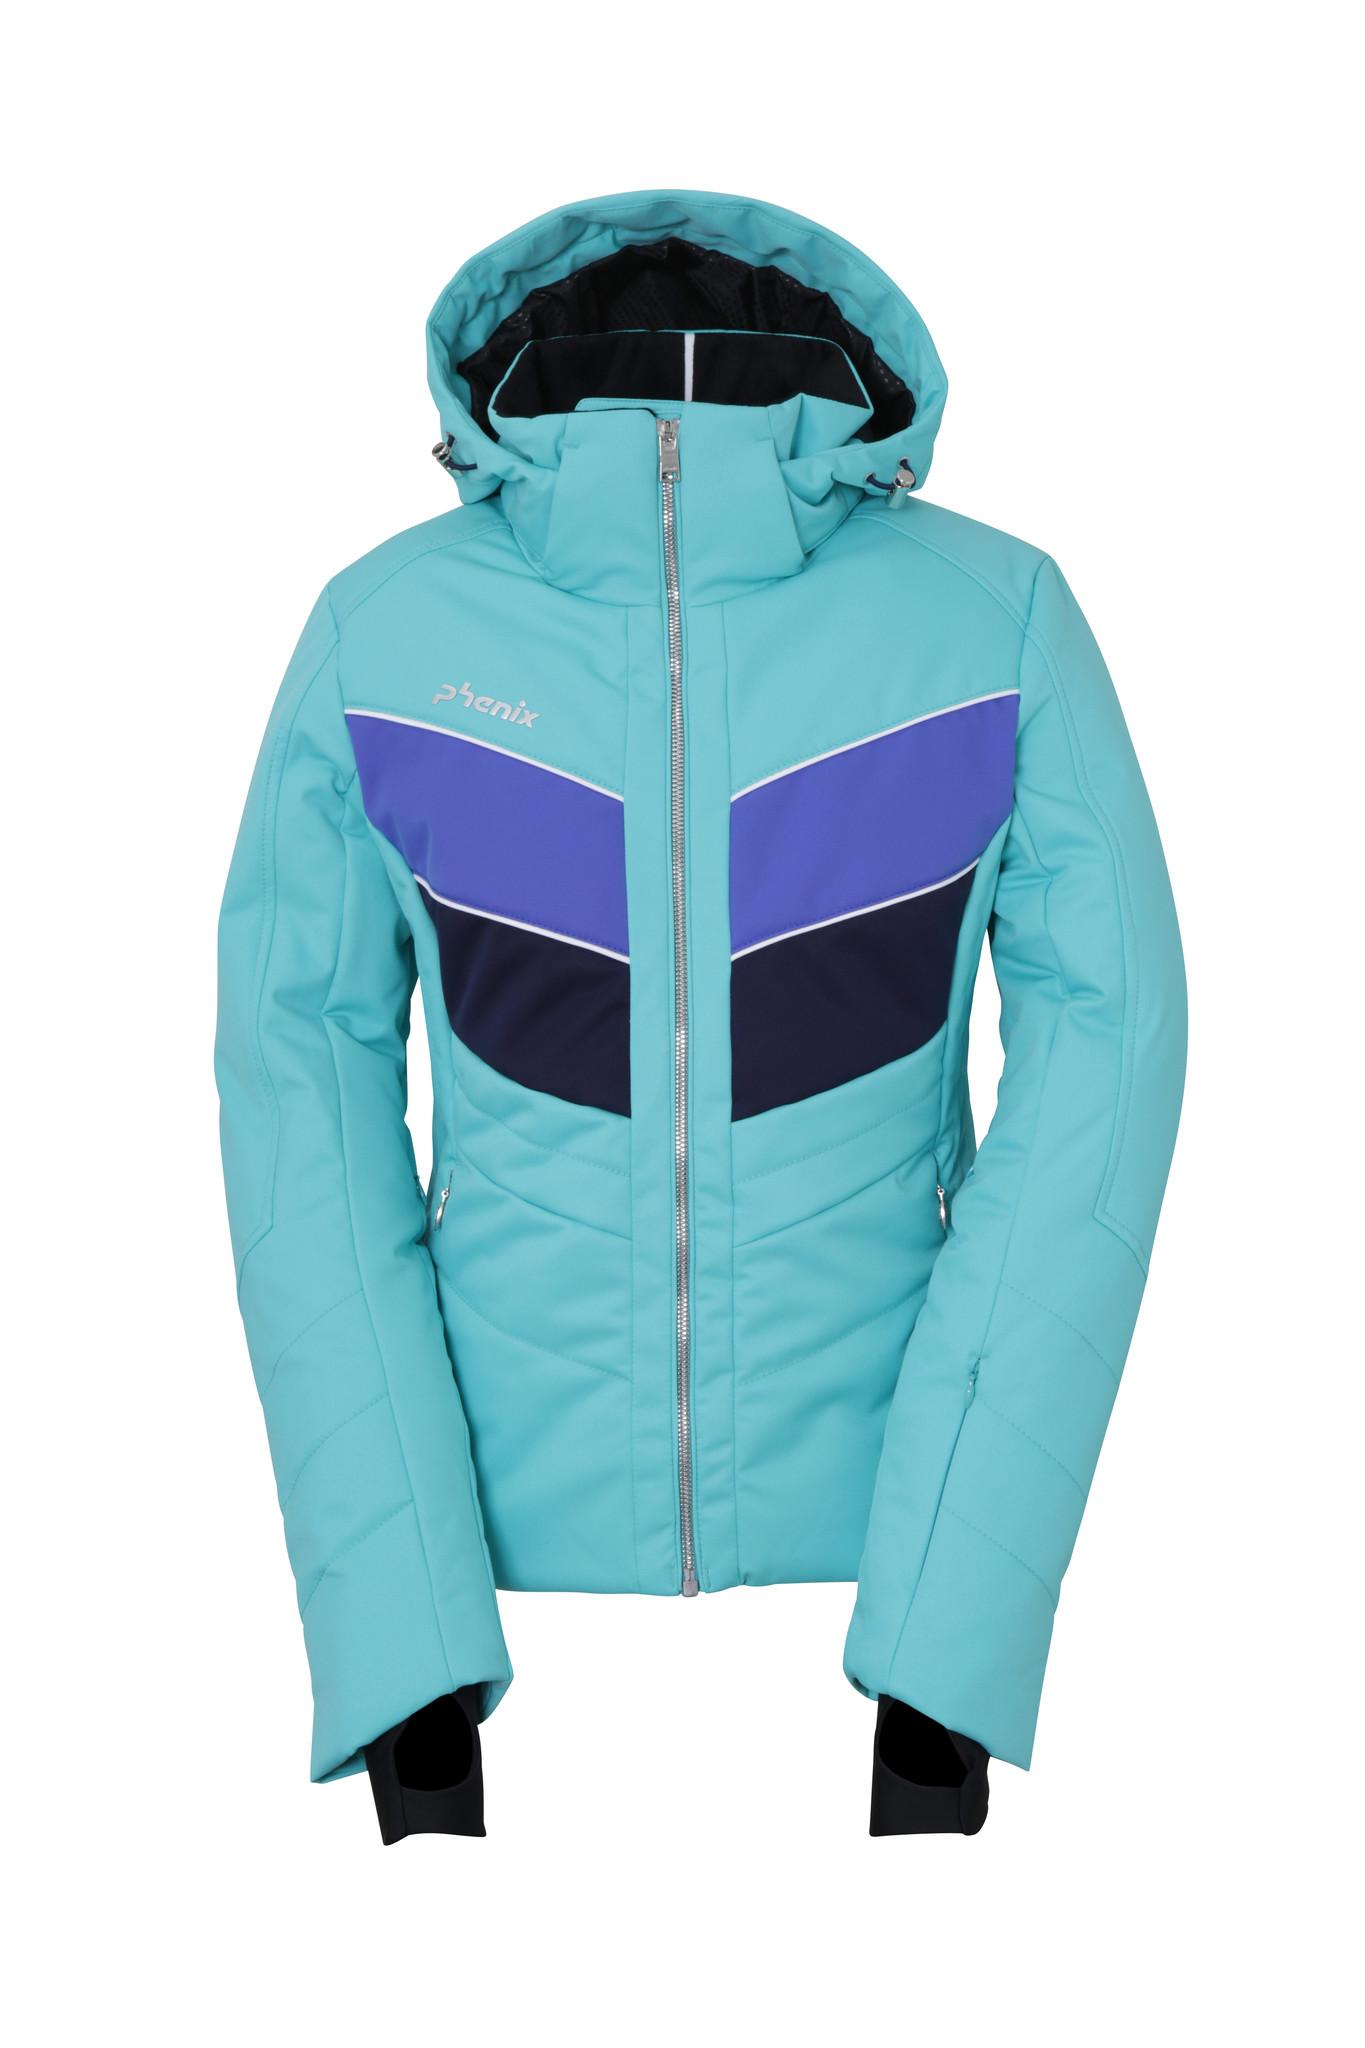 phenix Furano Jacket